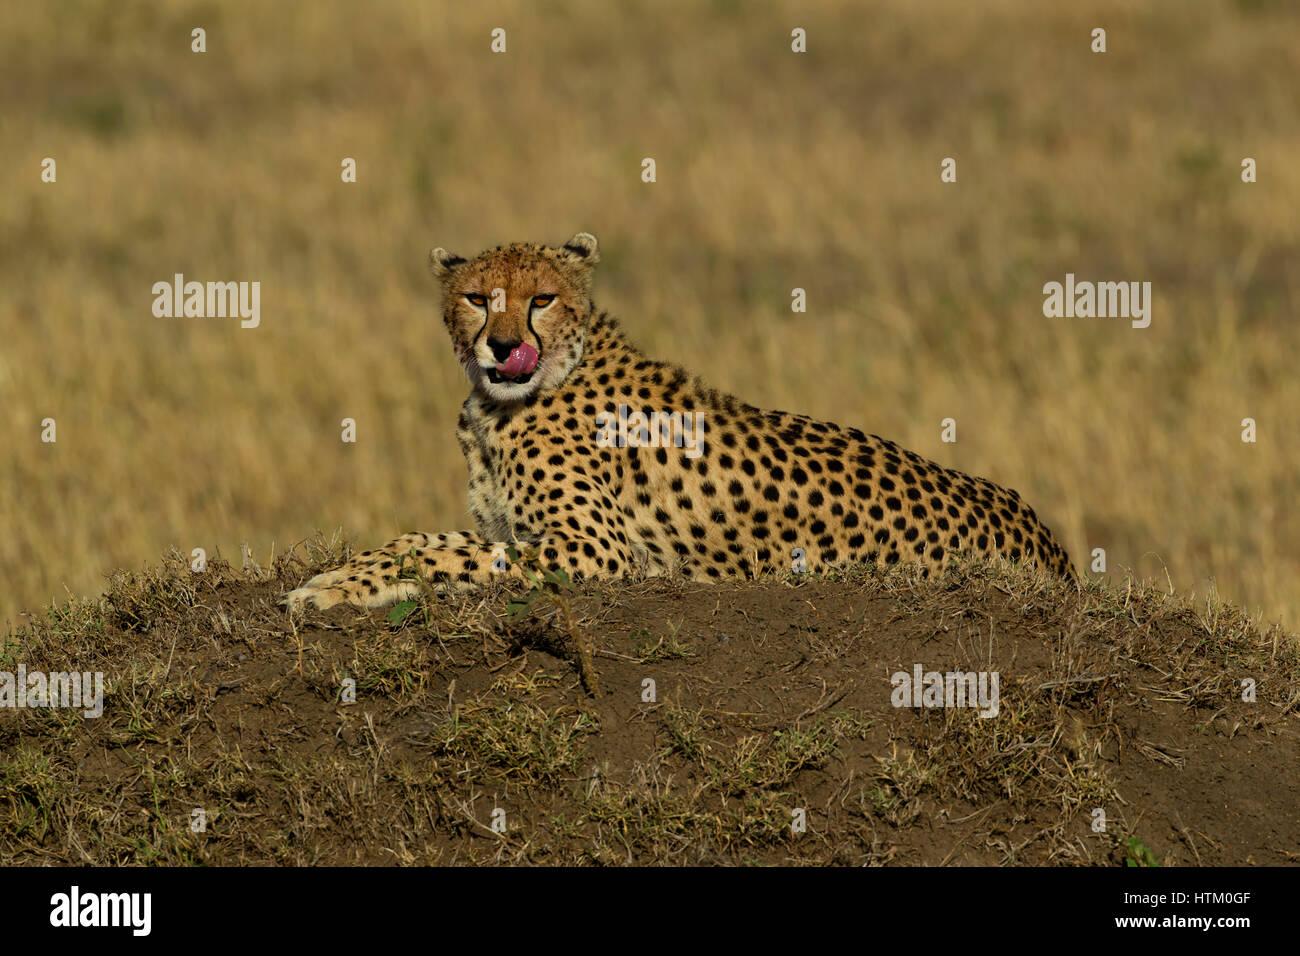 Cheetah (Acinonyx jubatus) resting on a dirt mound, Masai Mara National Reserve, Kenya, East Africa - Stock Image